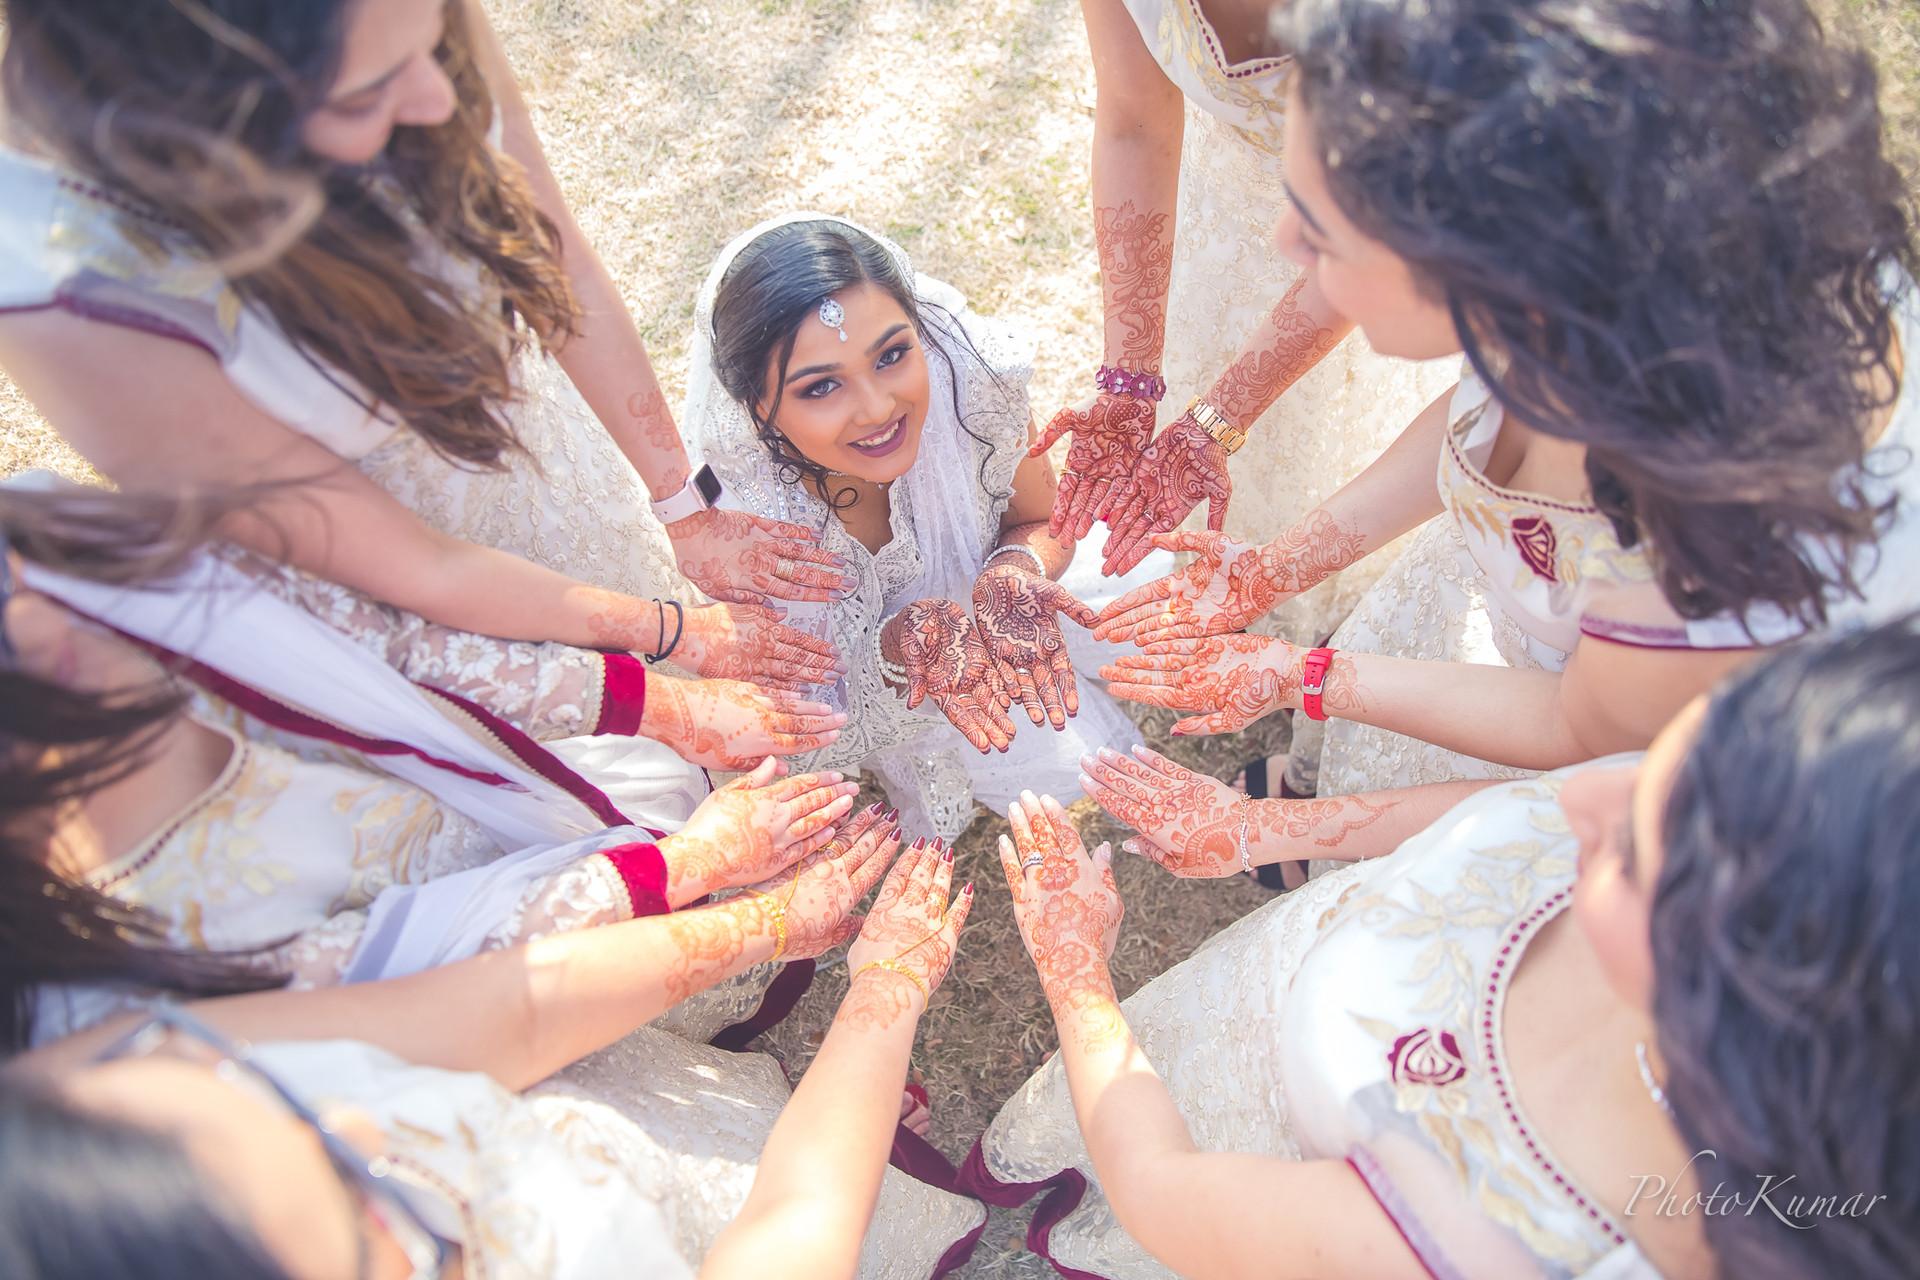 Photokumar-islamic-wedding-dallas-fort-worth-2018-15.jpg